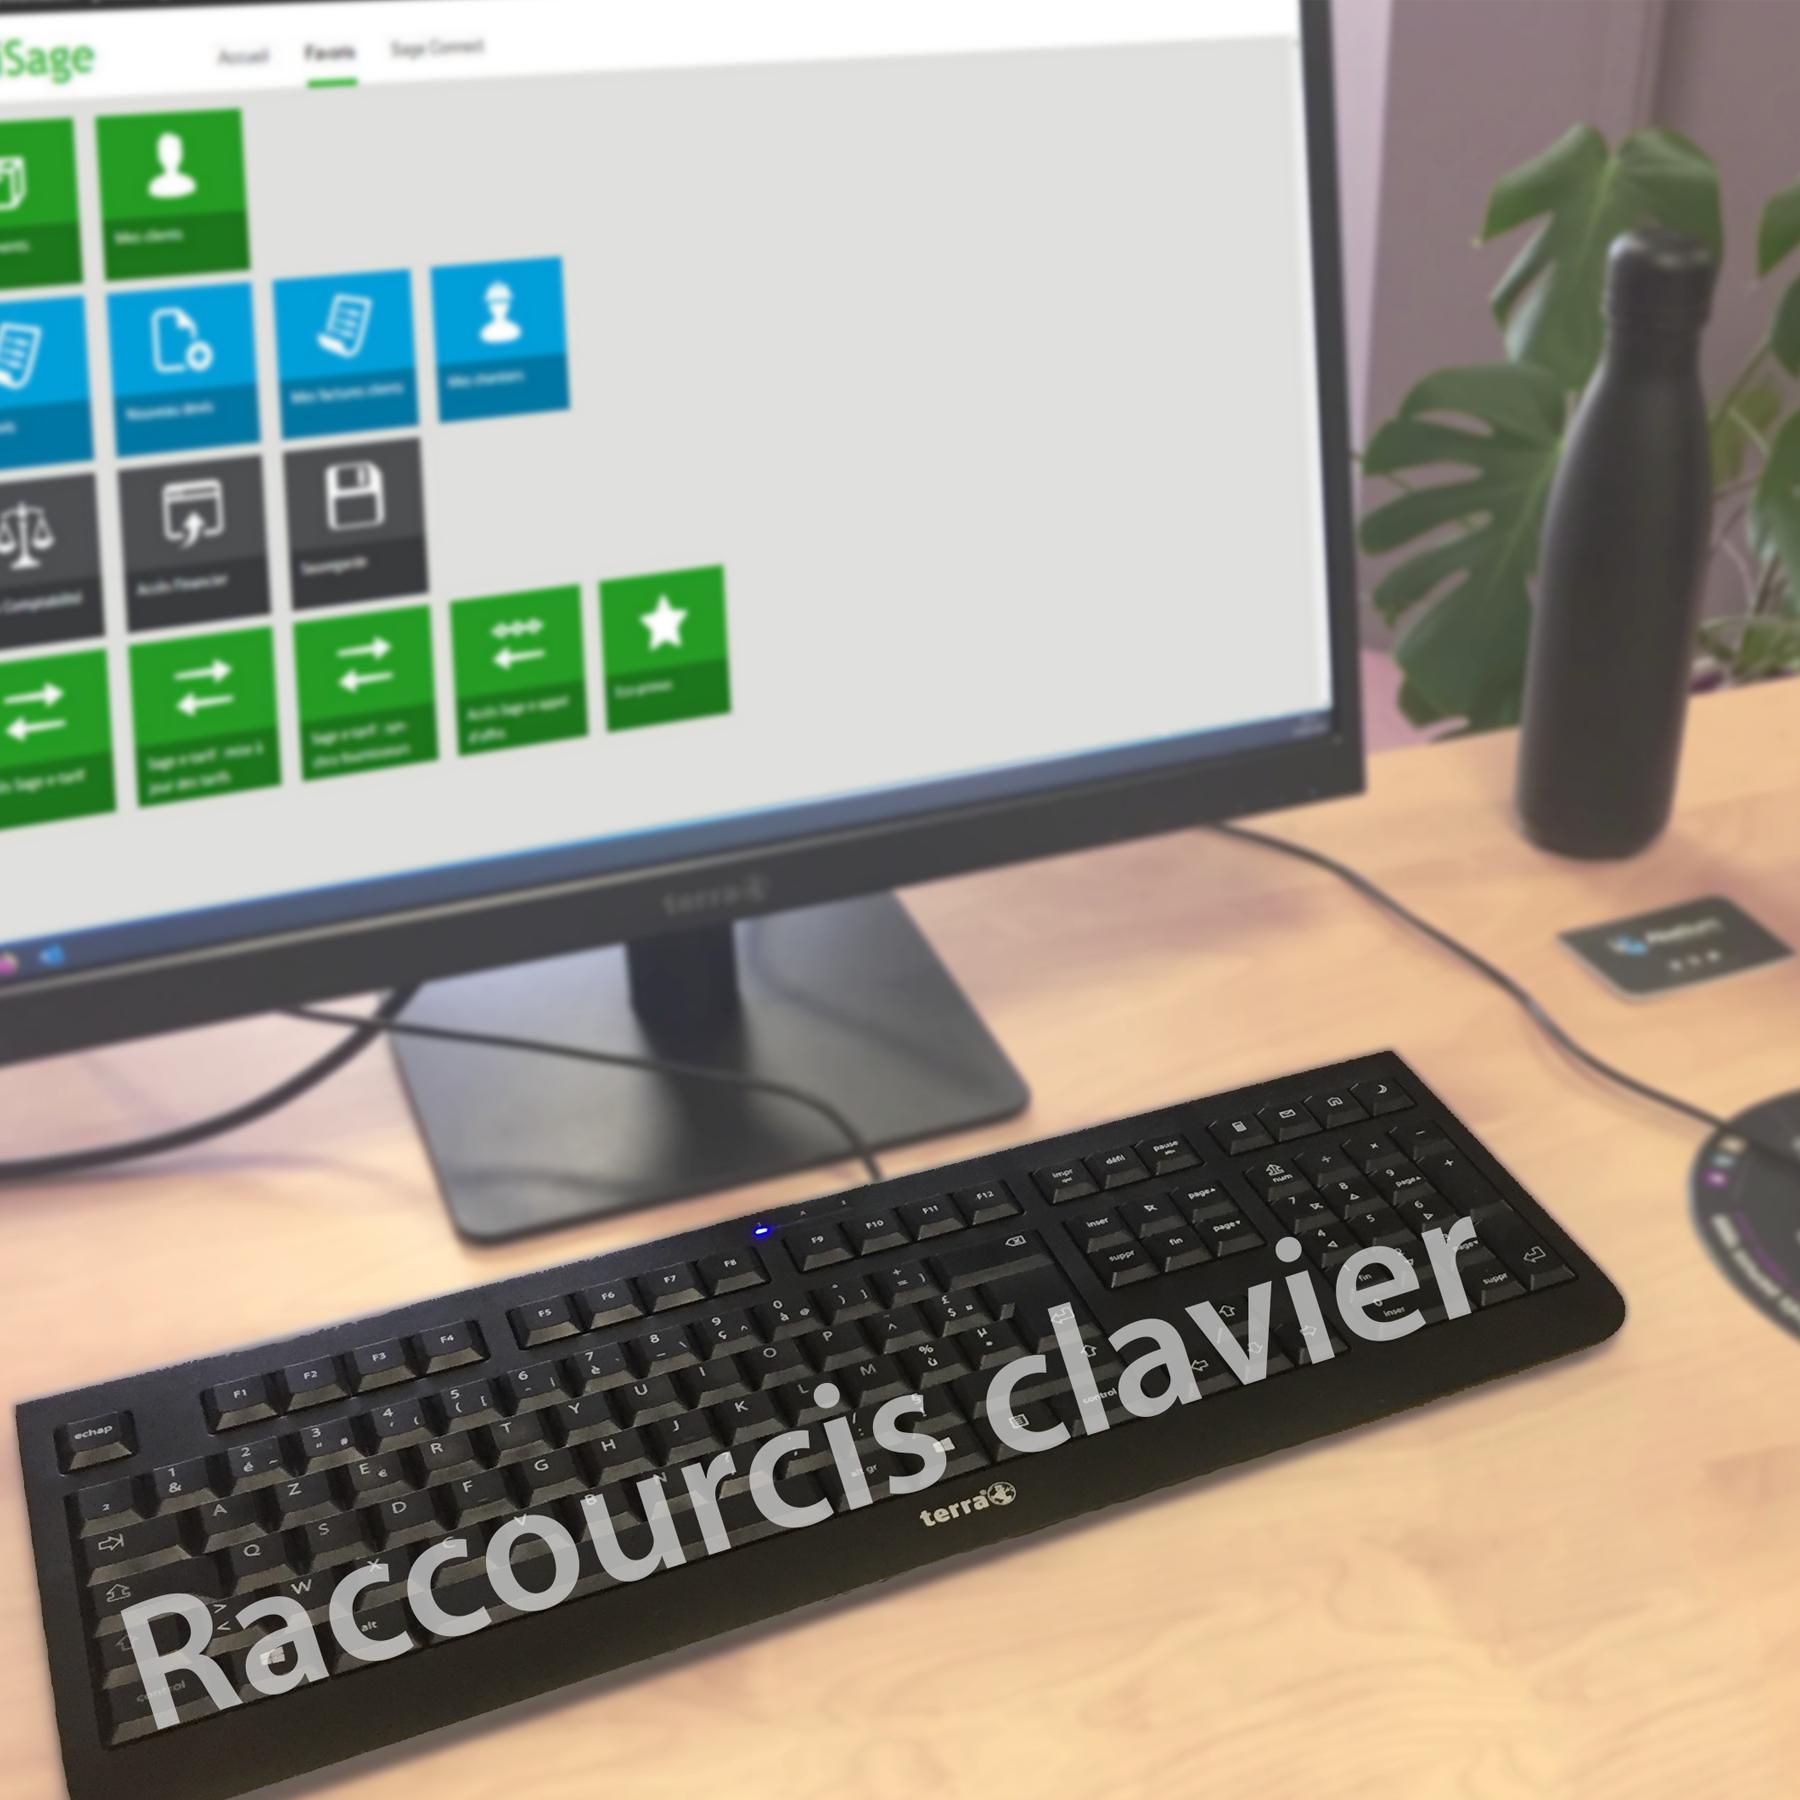 Raccourcis Clavier Batigest